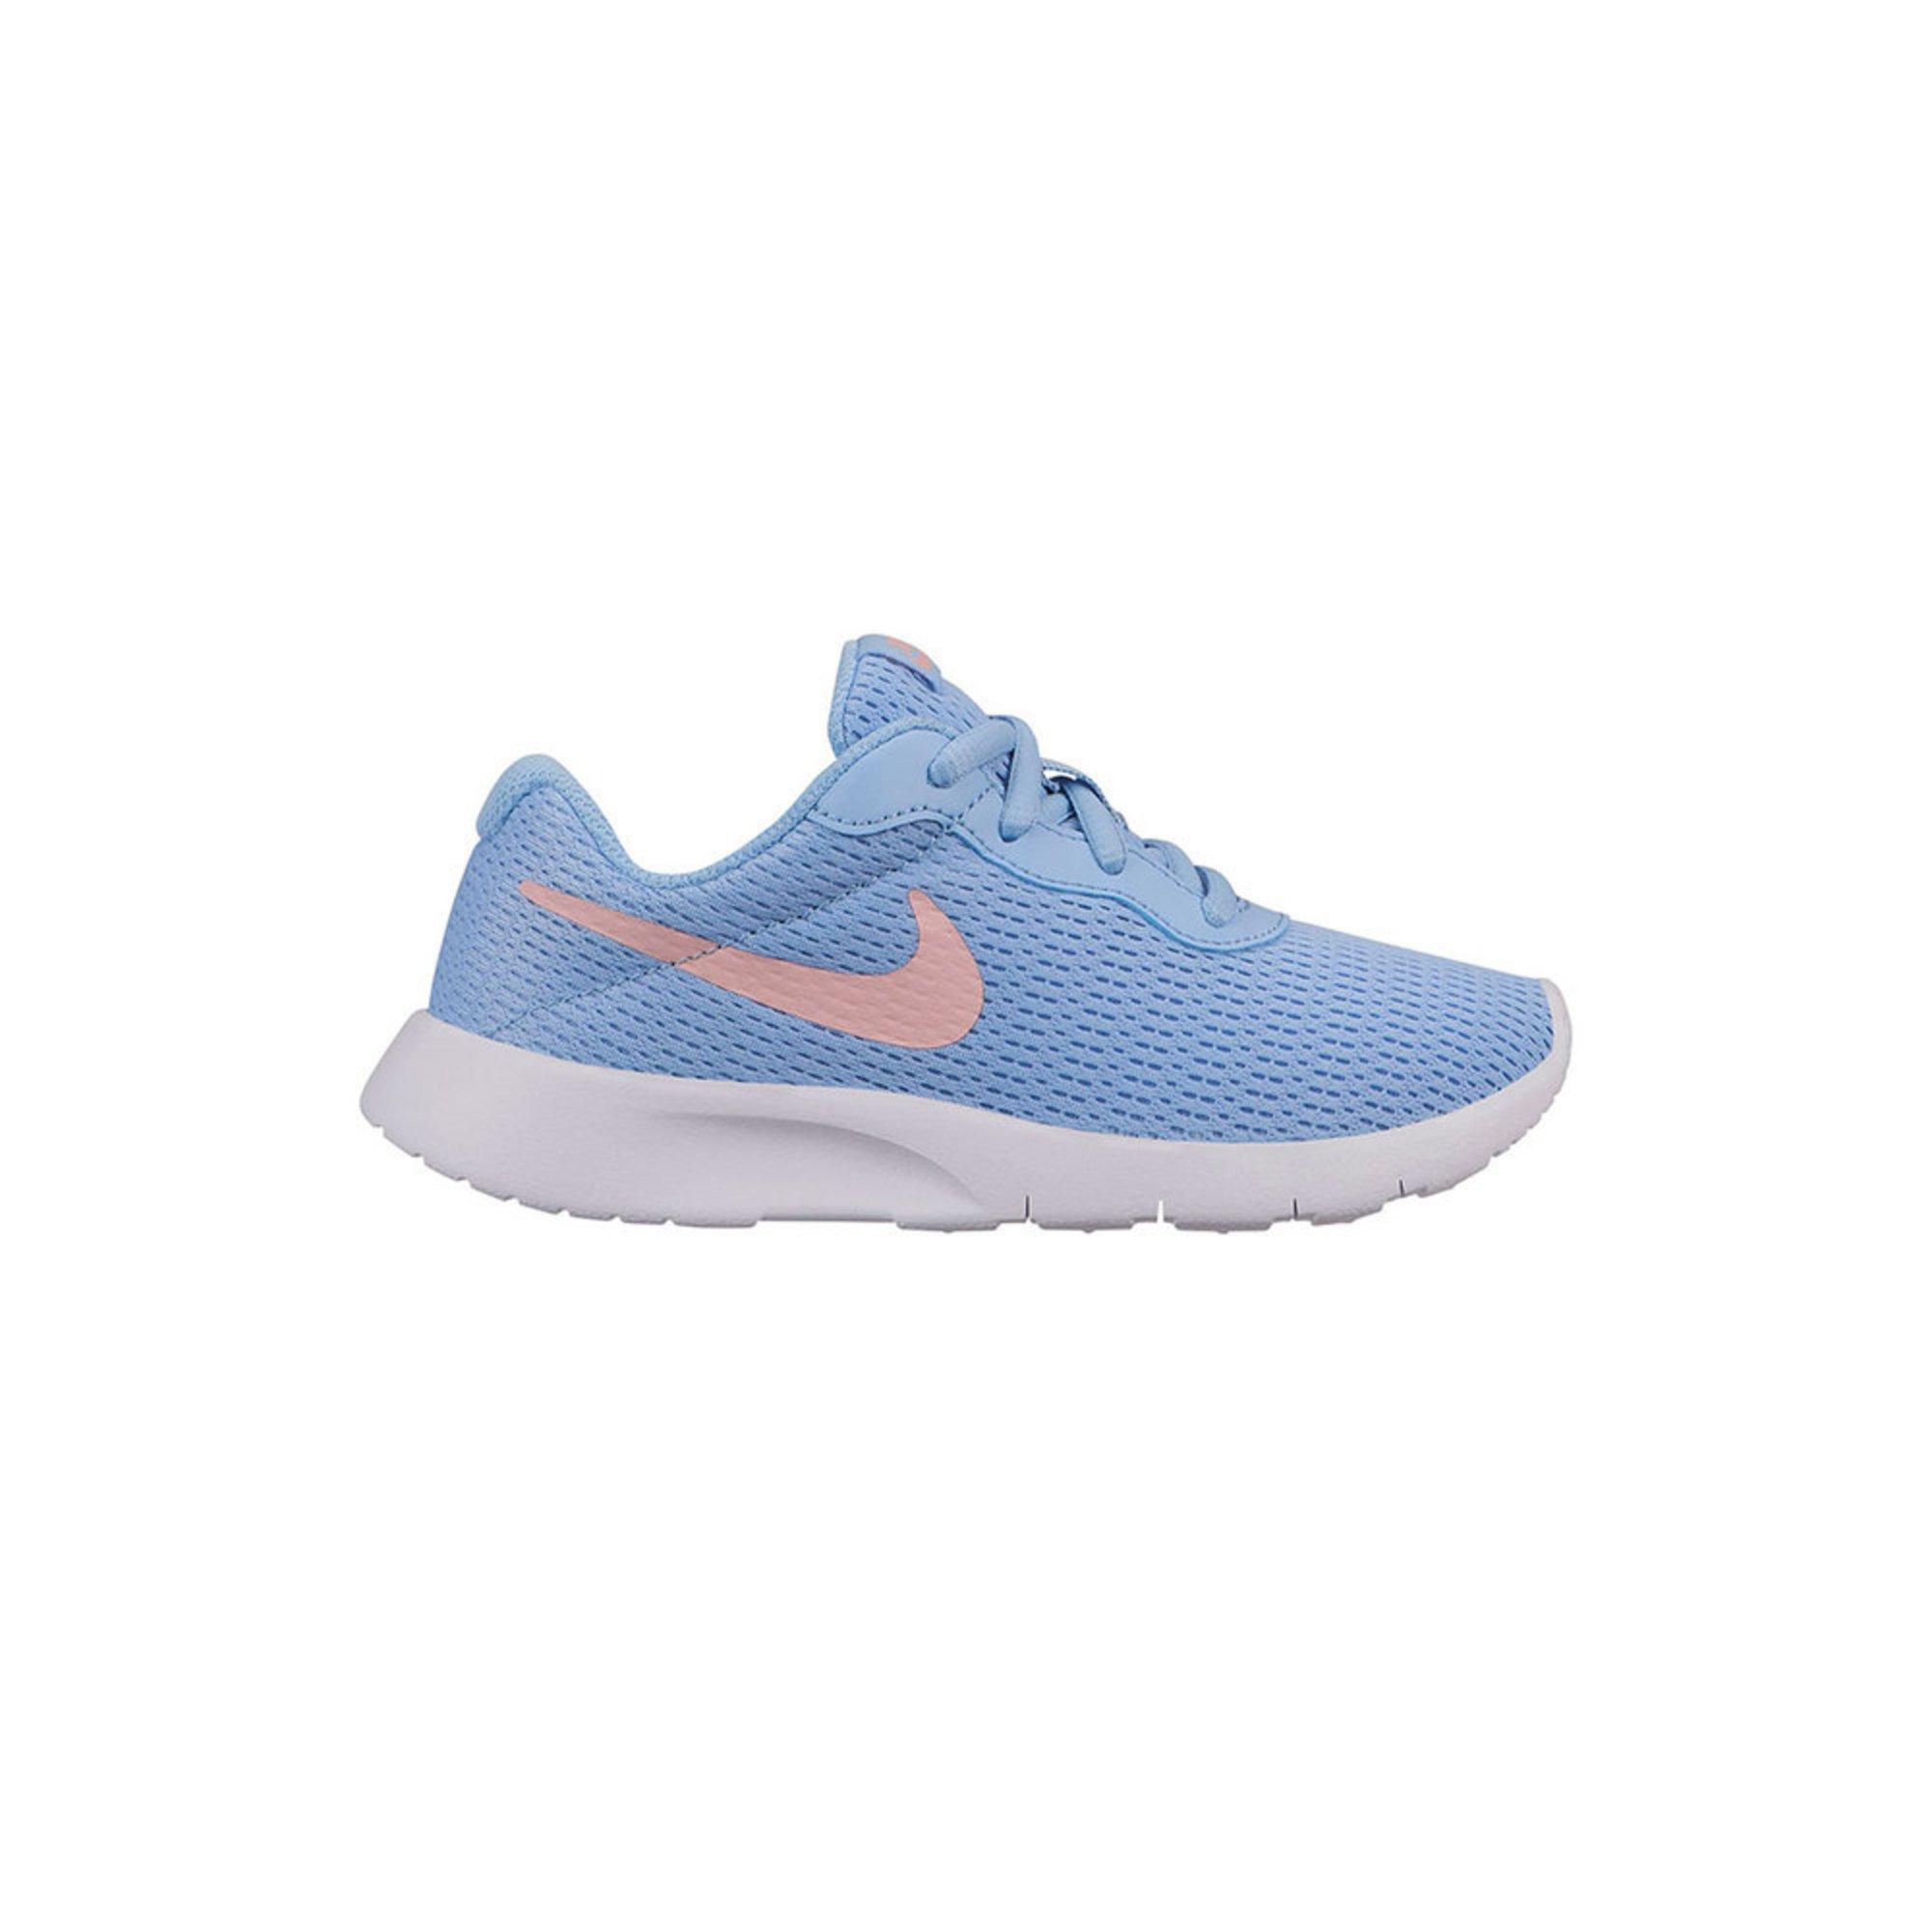 0b581e78c0 Nike Girls Tanjun Training Shoe (little Kid)   Little Kid Shoes ...